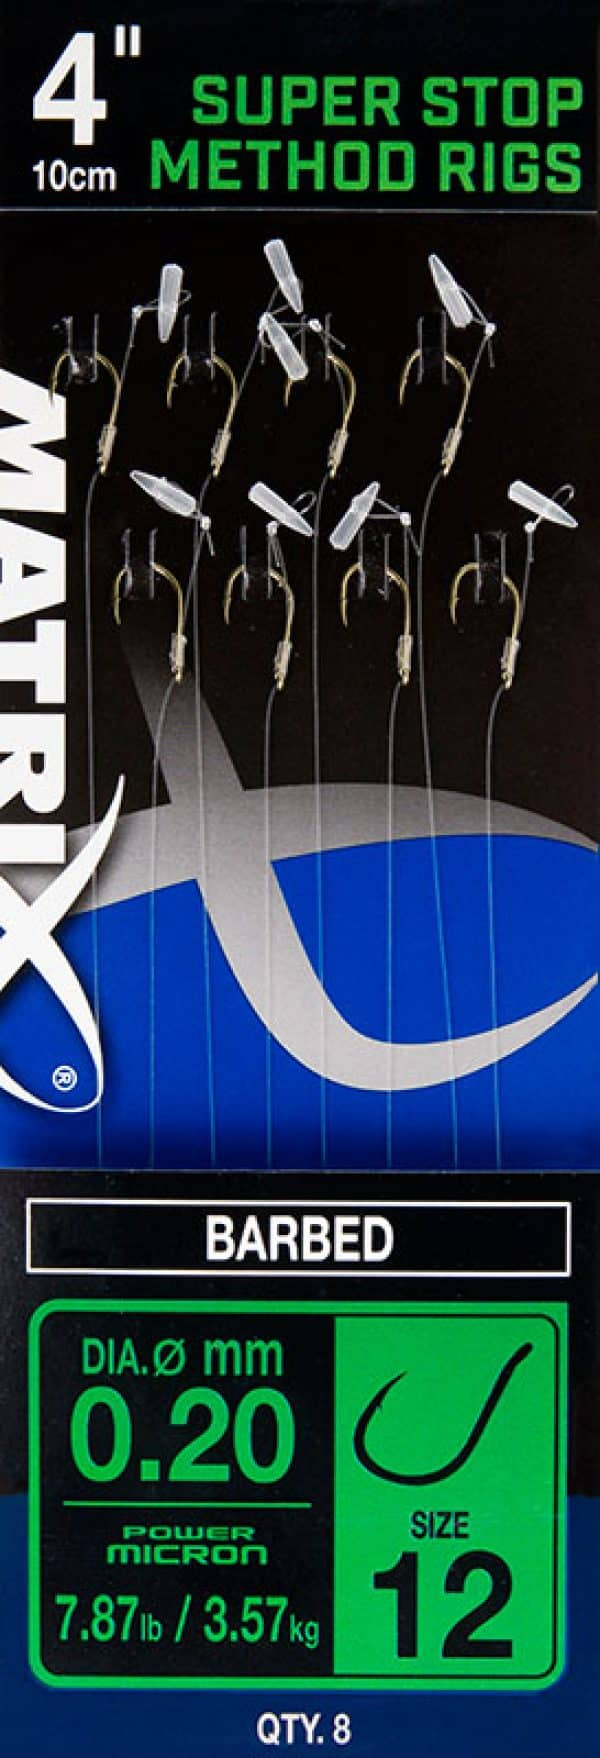 "MATRIX 4"" FEEDER RIGGER METHOD RIGS SIZE 12 BARBED X 8 SPIKE (GRR013)"